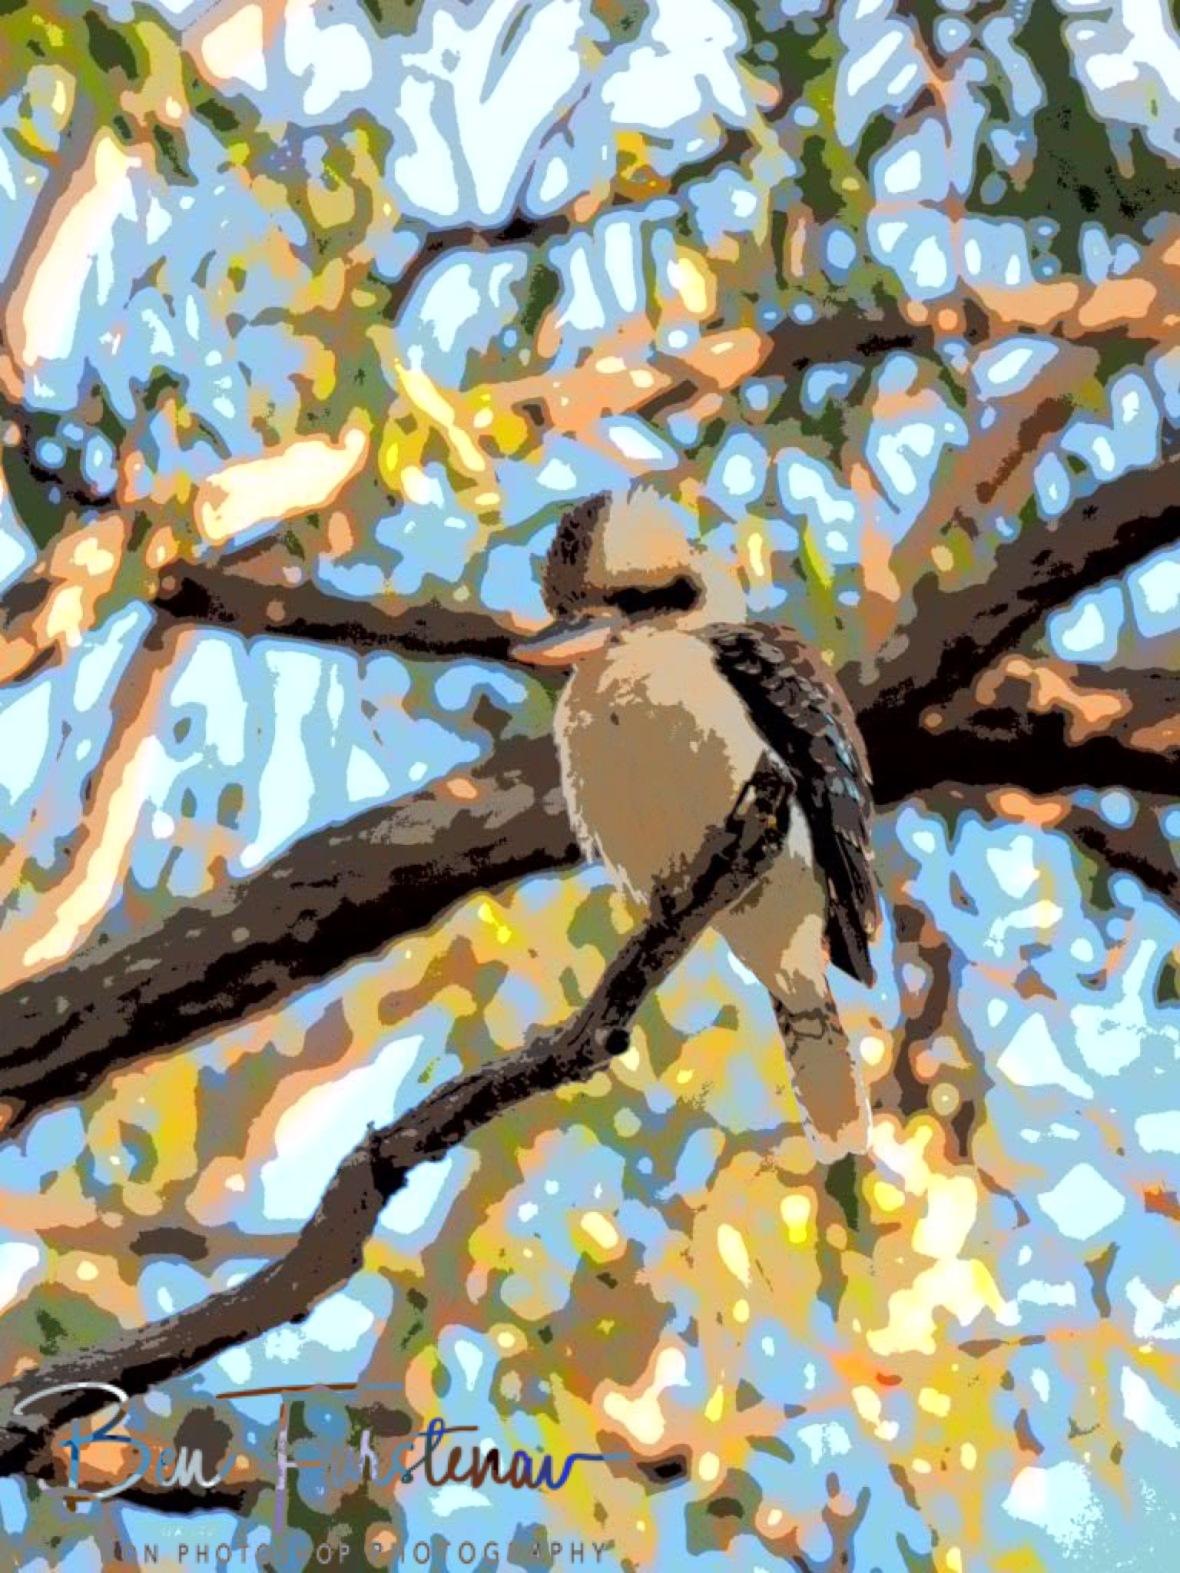 Kookaburra in painting, Atherton Tablelands, Far North Queensland, Australia